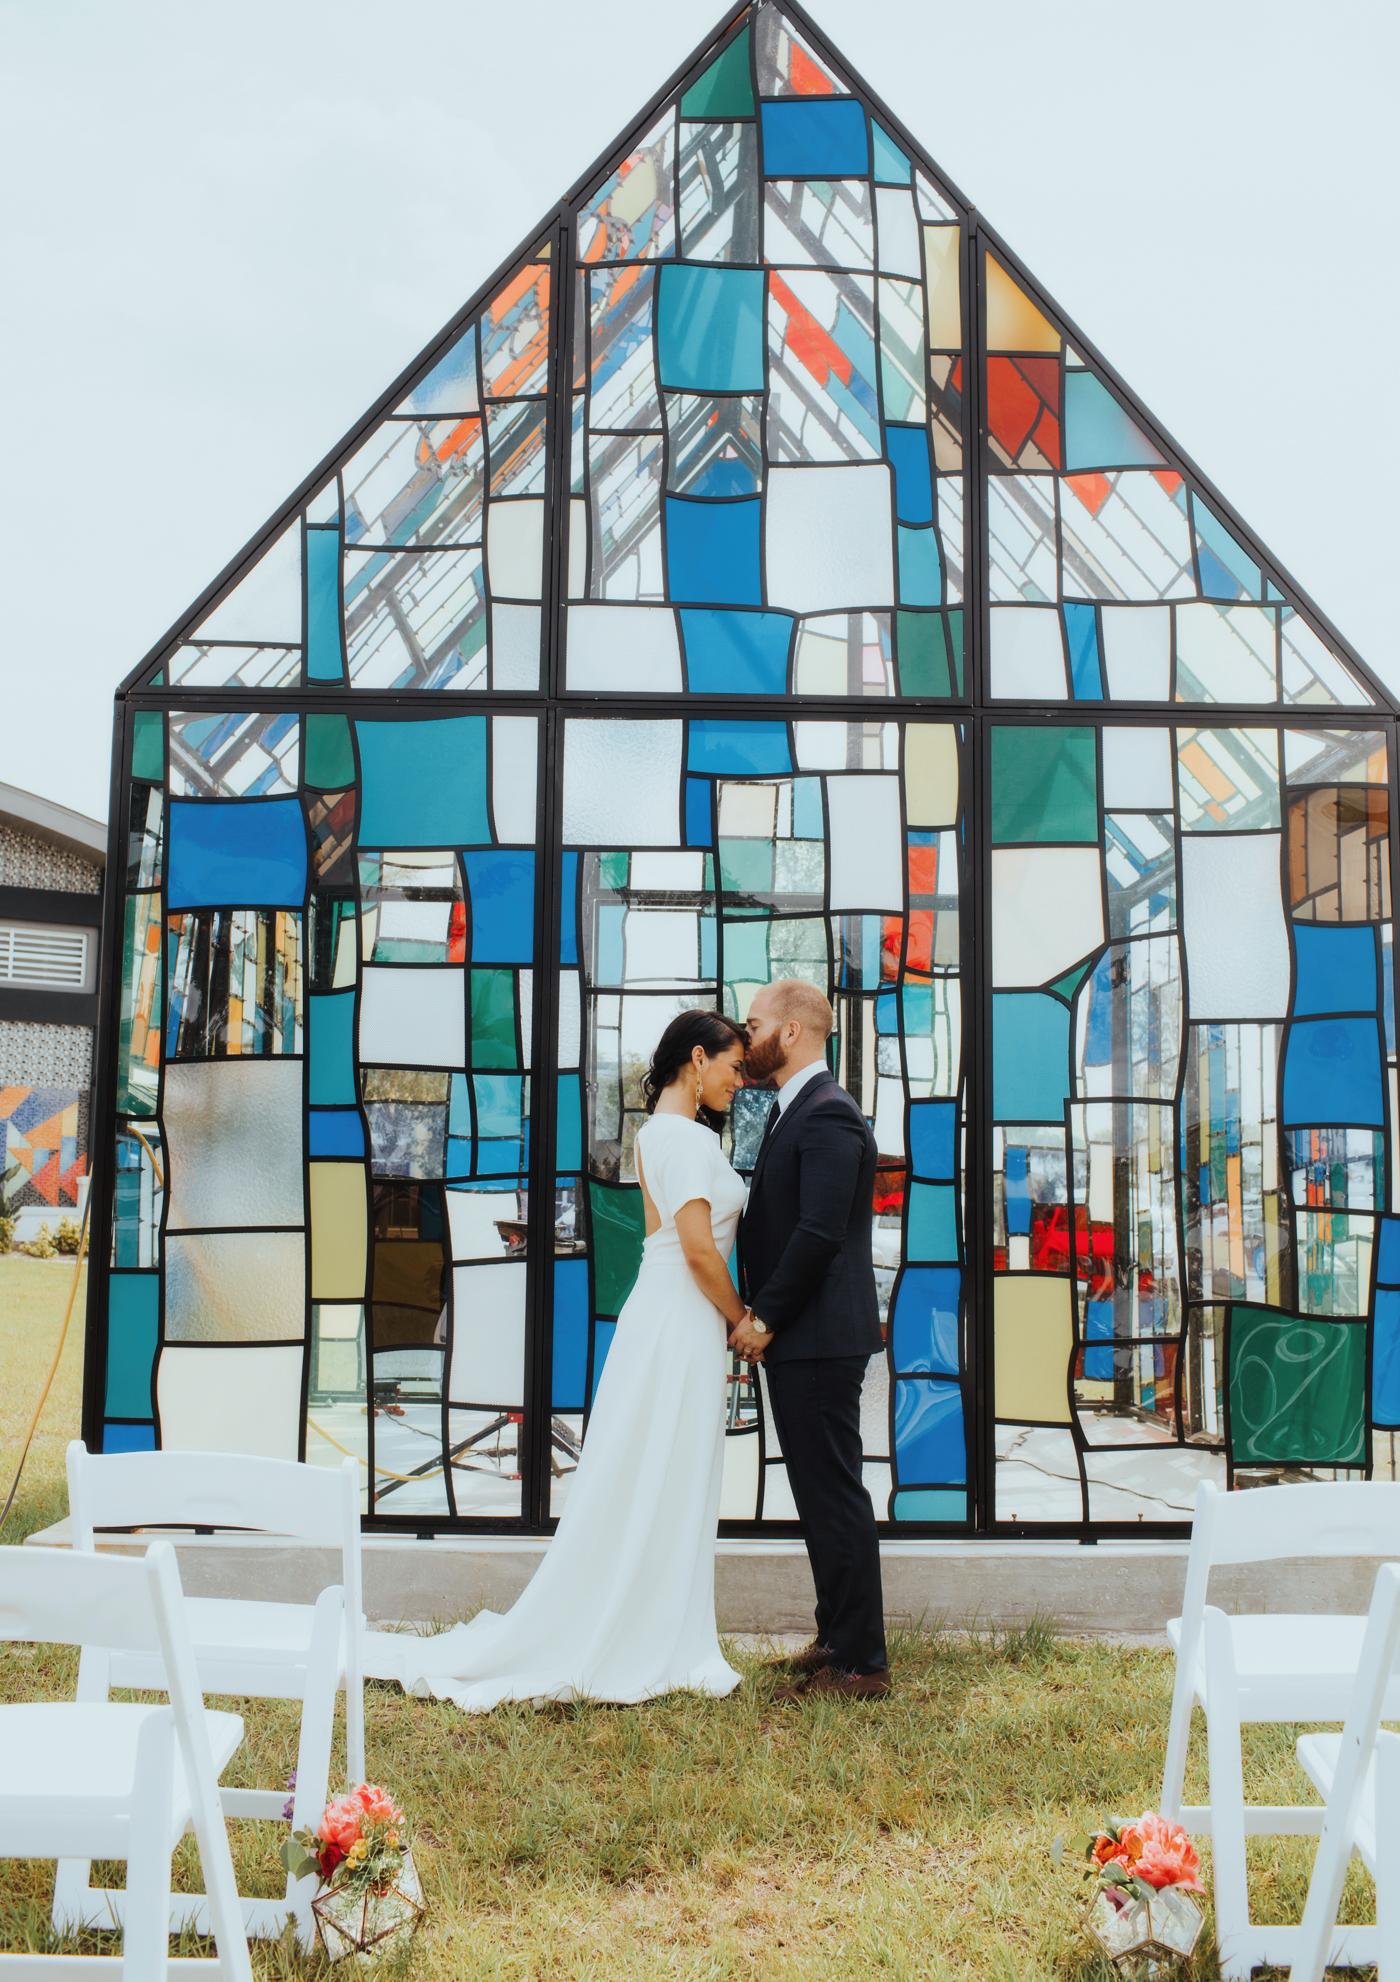 Wedding | Canvas Market | Lake Nona-Orlando, FL  | Vanessa Boy Photography | vanessaboy.com-281.com |Green Wedding Shoes.jpg